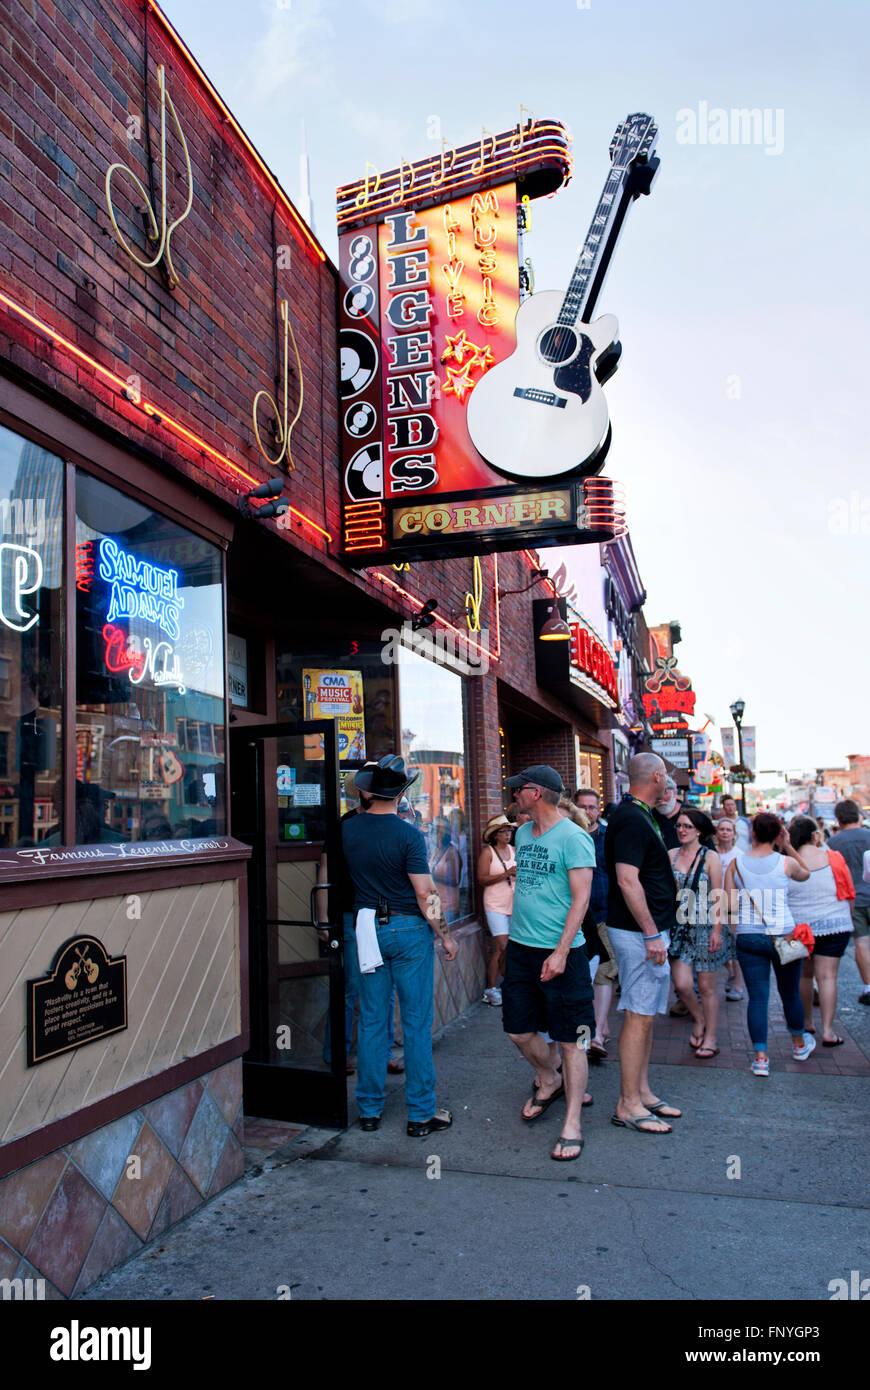 Legends Corner a popular restaurant / bar in Nashville Tennessee - Stock Image